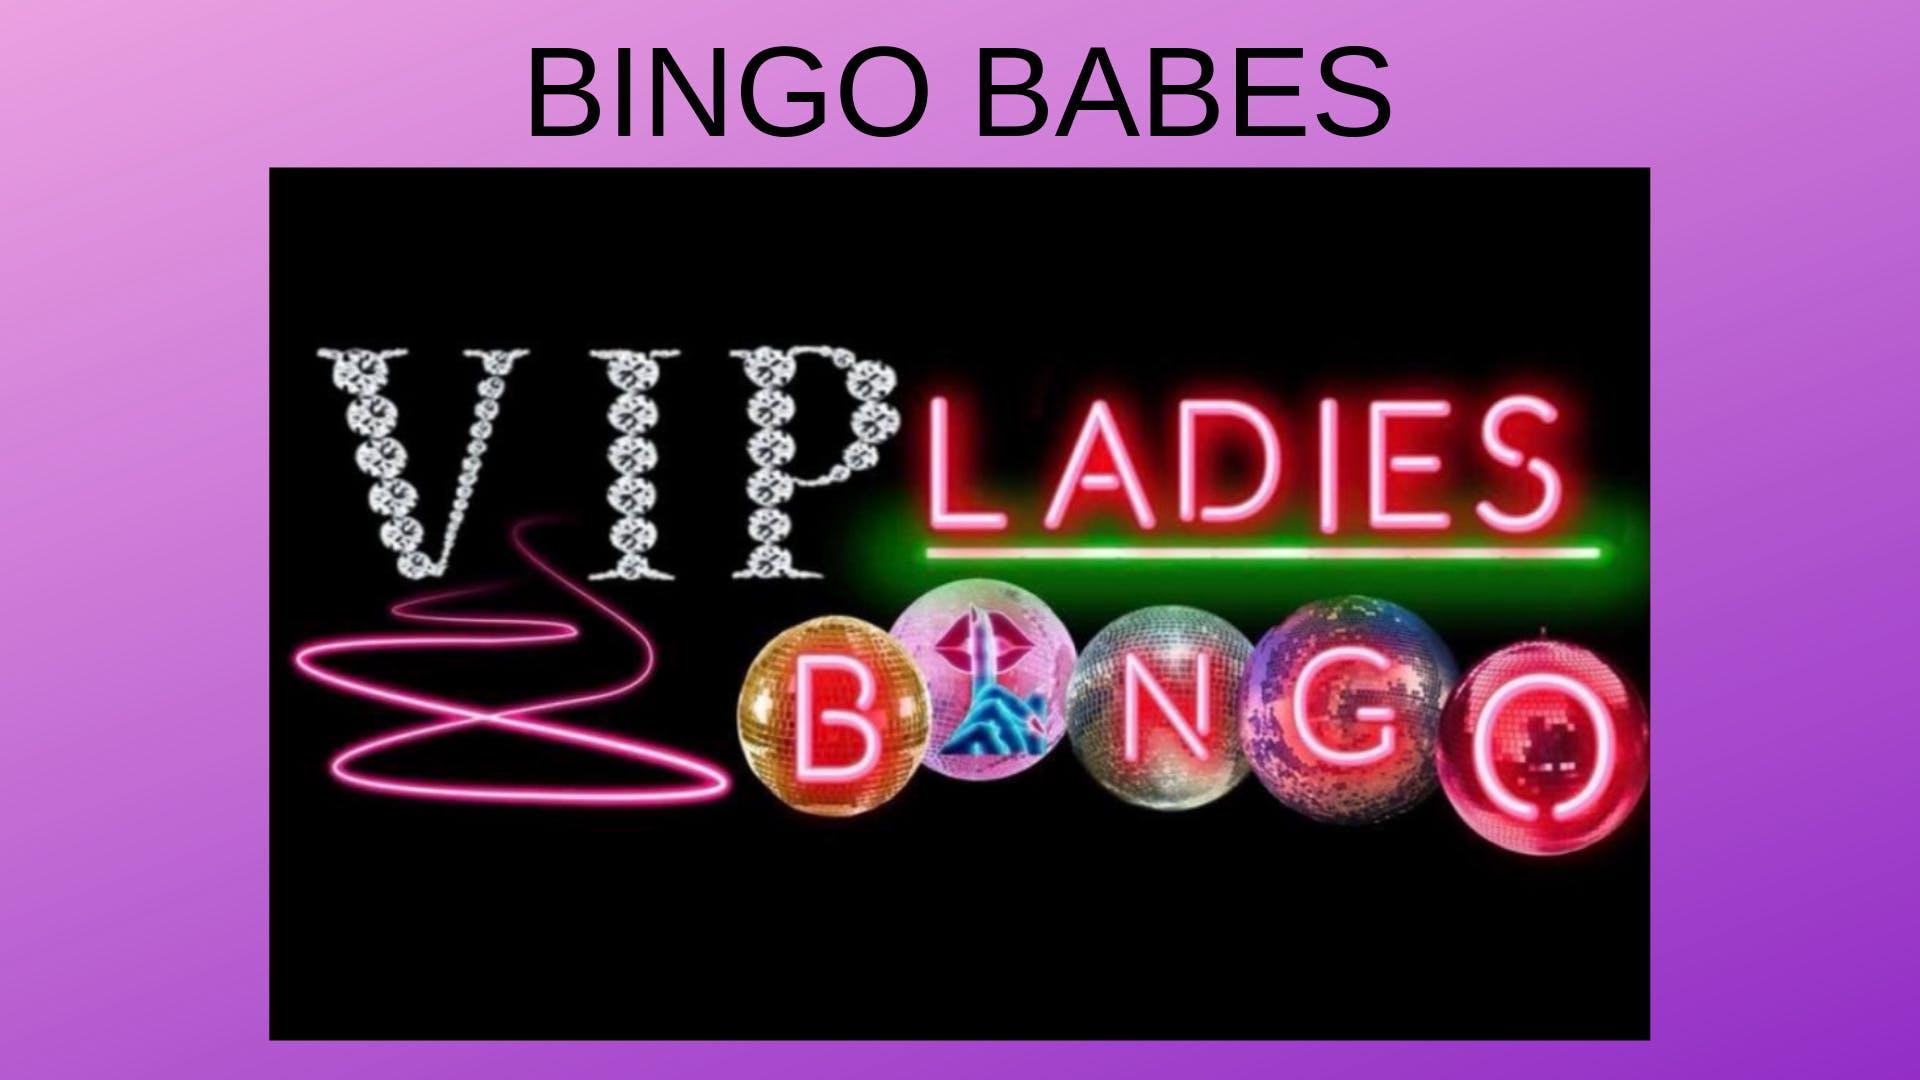 Ladies Red, White & Bingo Night FBO Lil Bit of Love Rescue banner